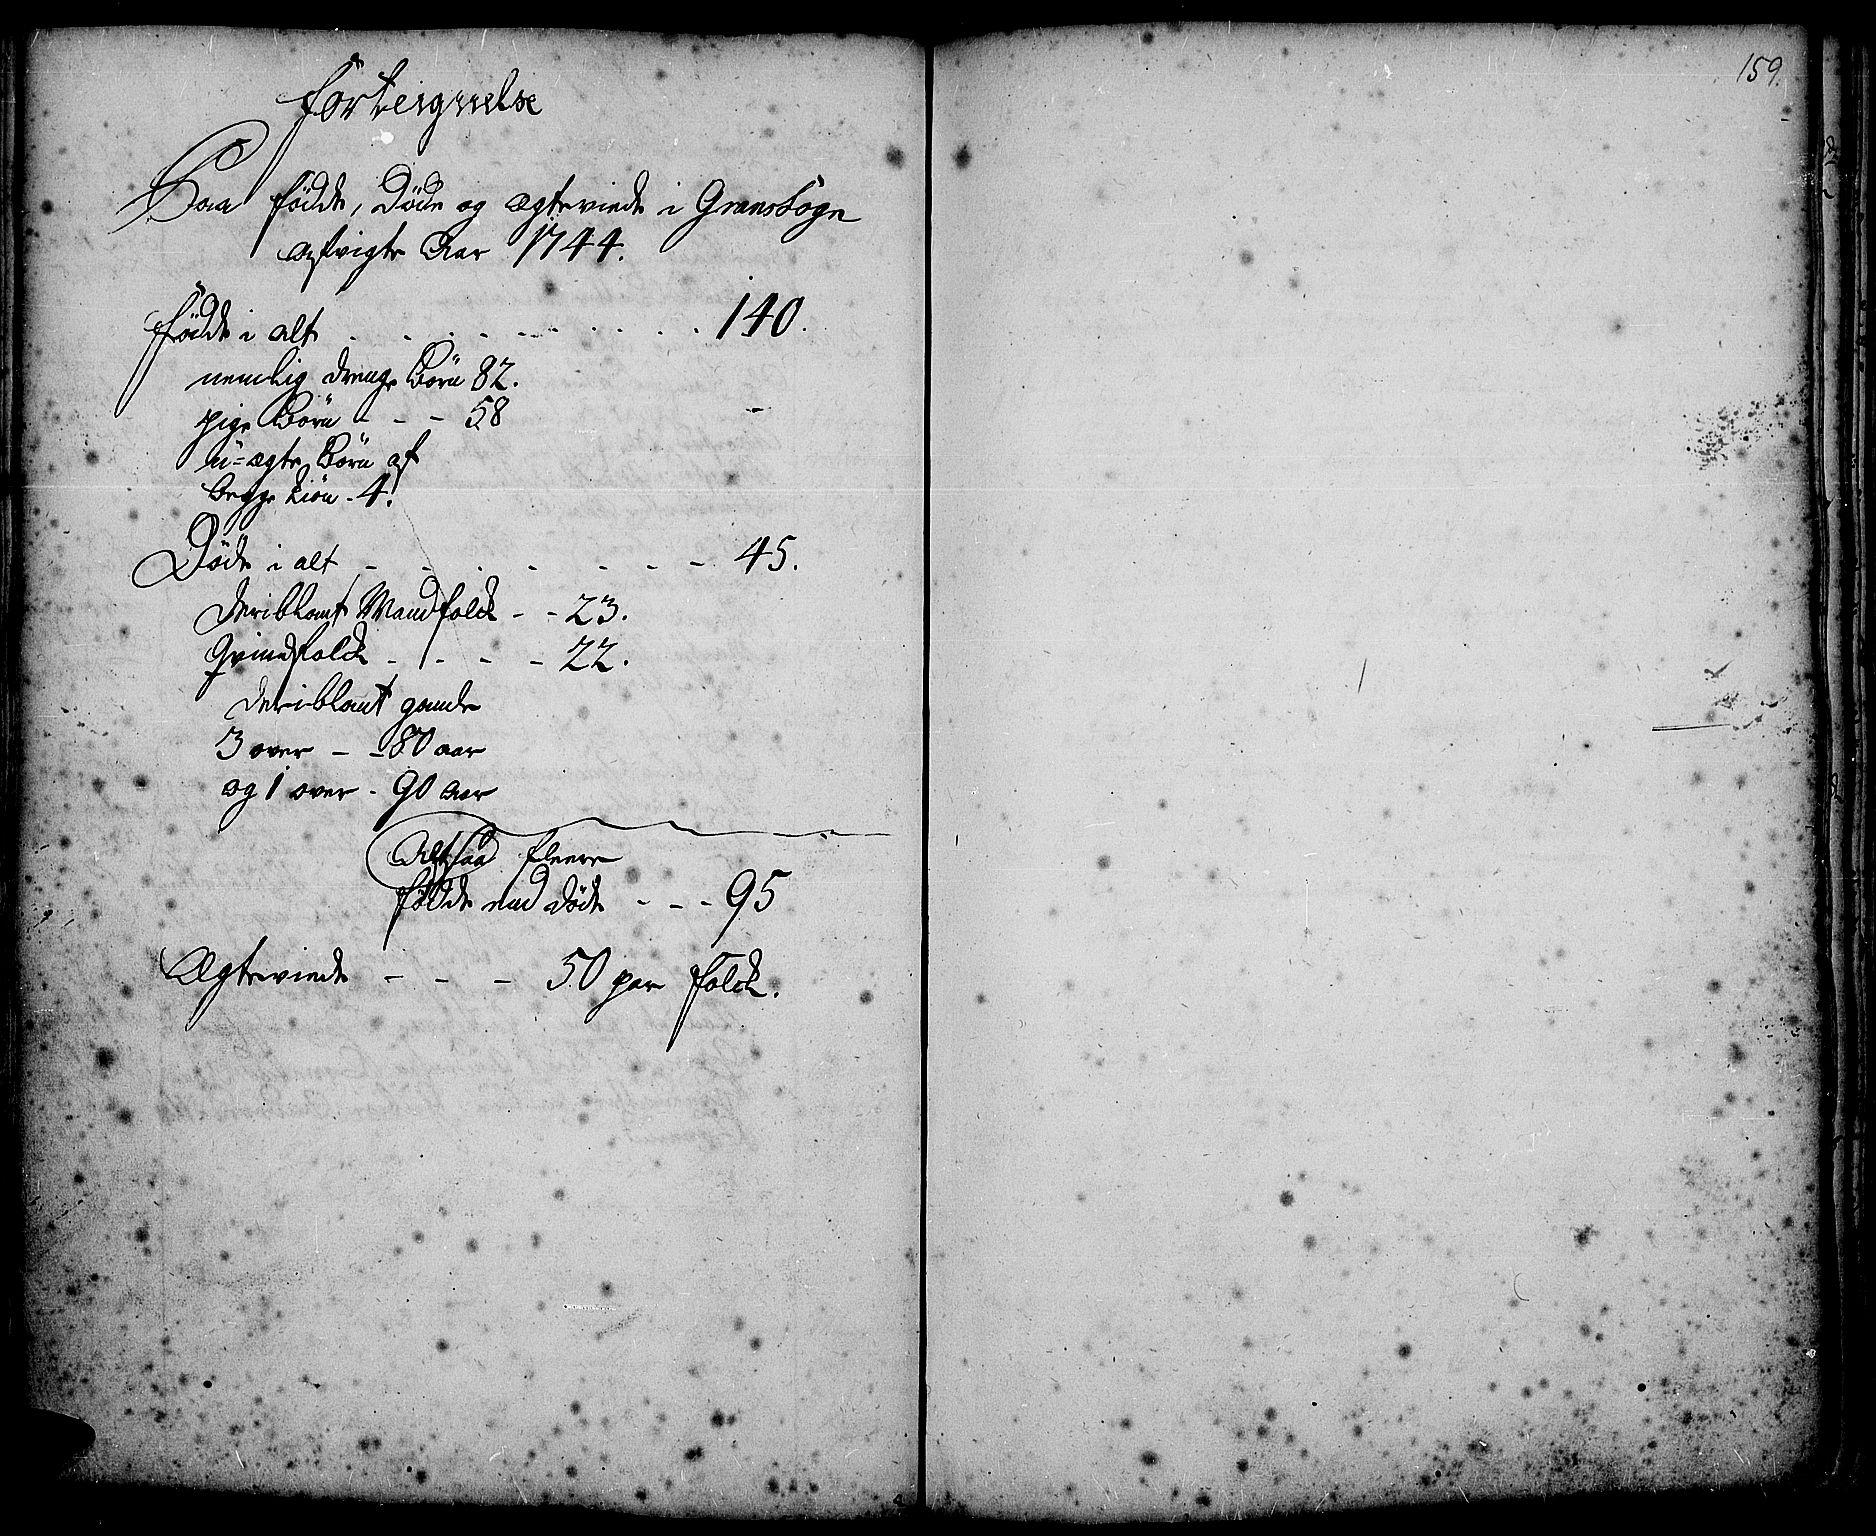 SAH, Gran prestekontor, Ministerialbok nr. 2, 1732-1744, s. 159